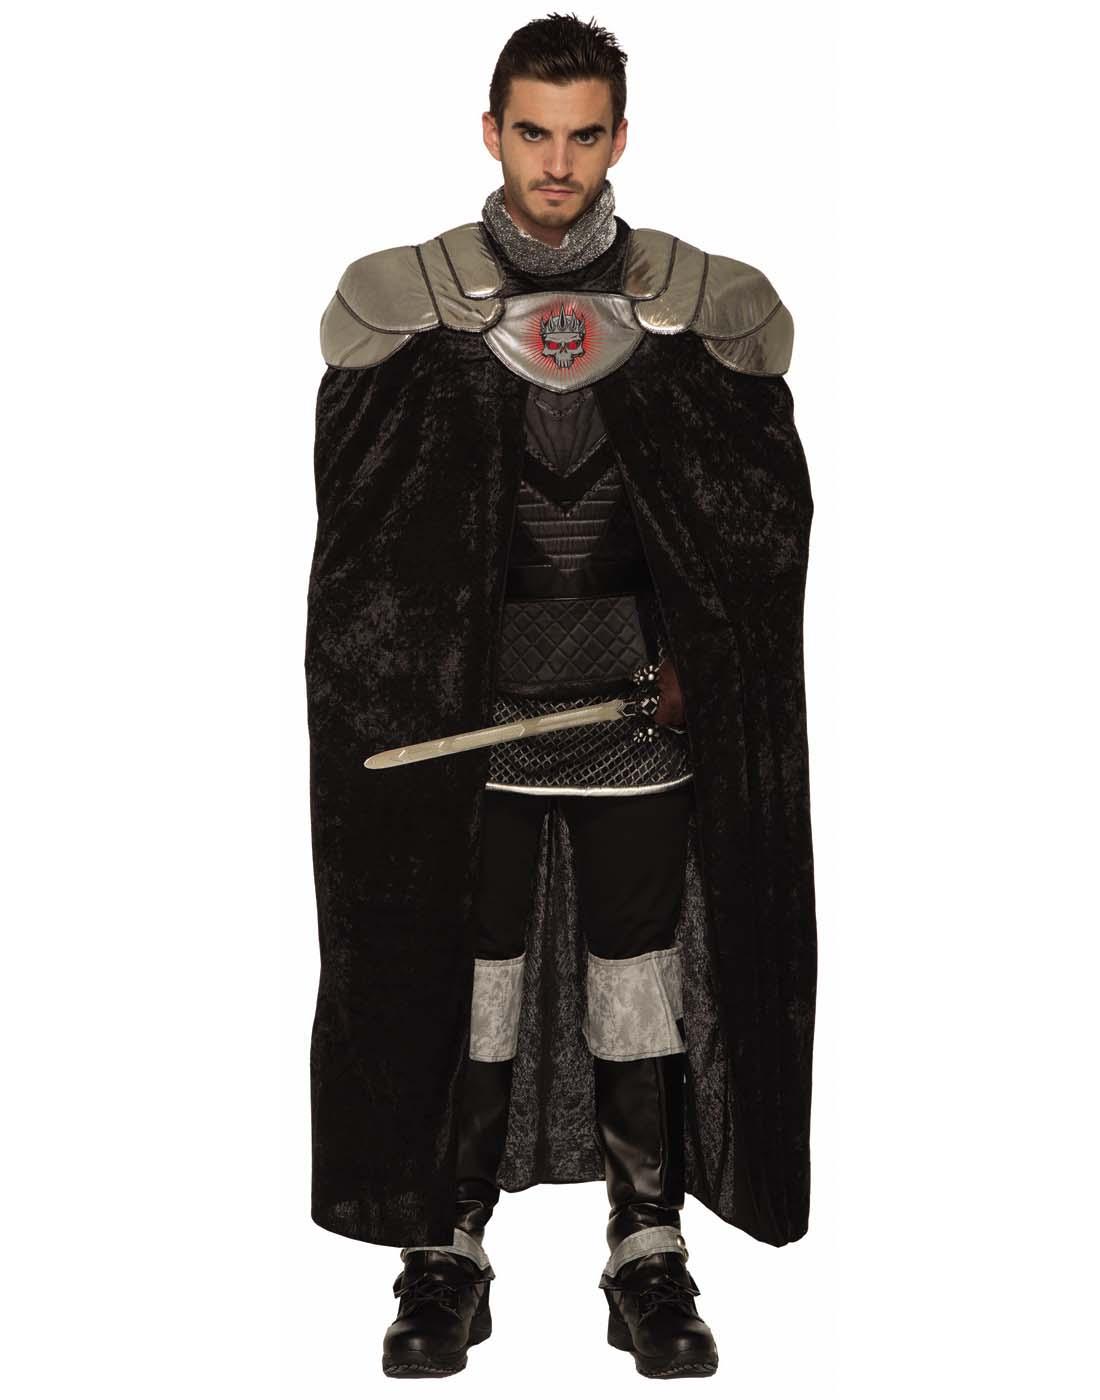 Dark Royalty Black King Crown Costume Accessory